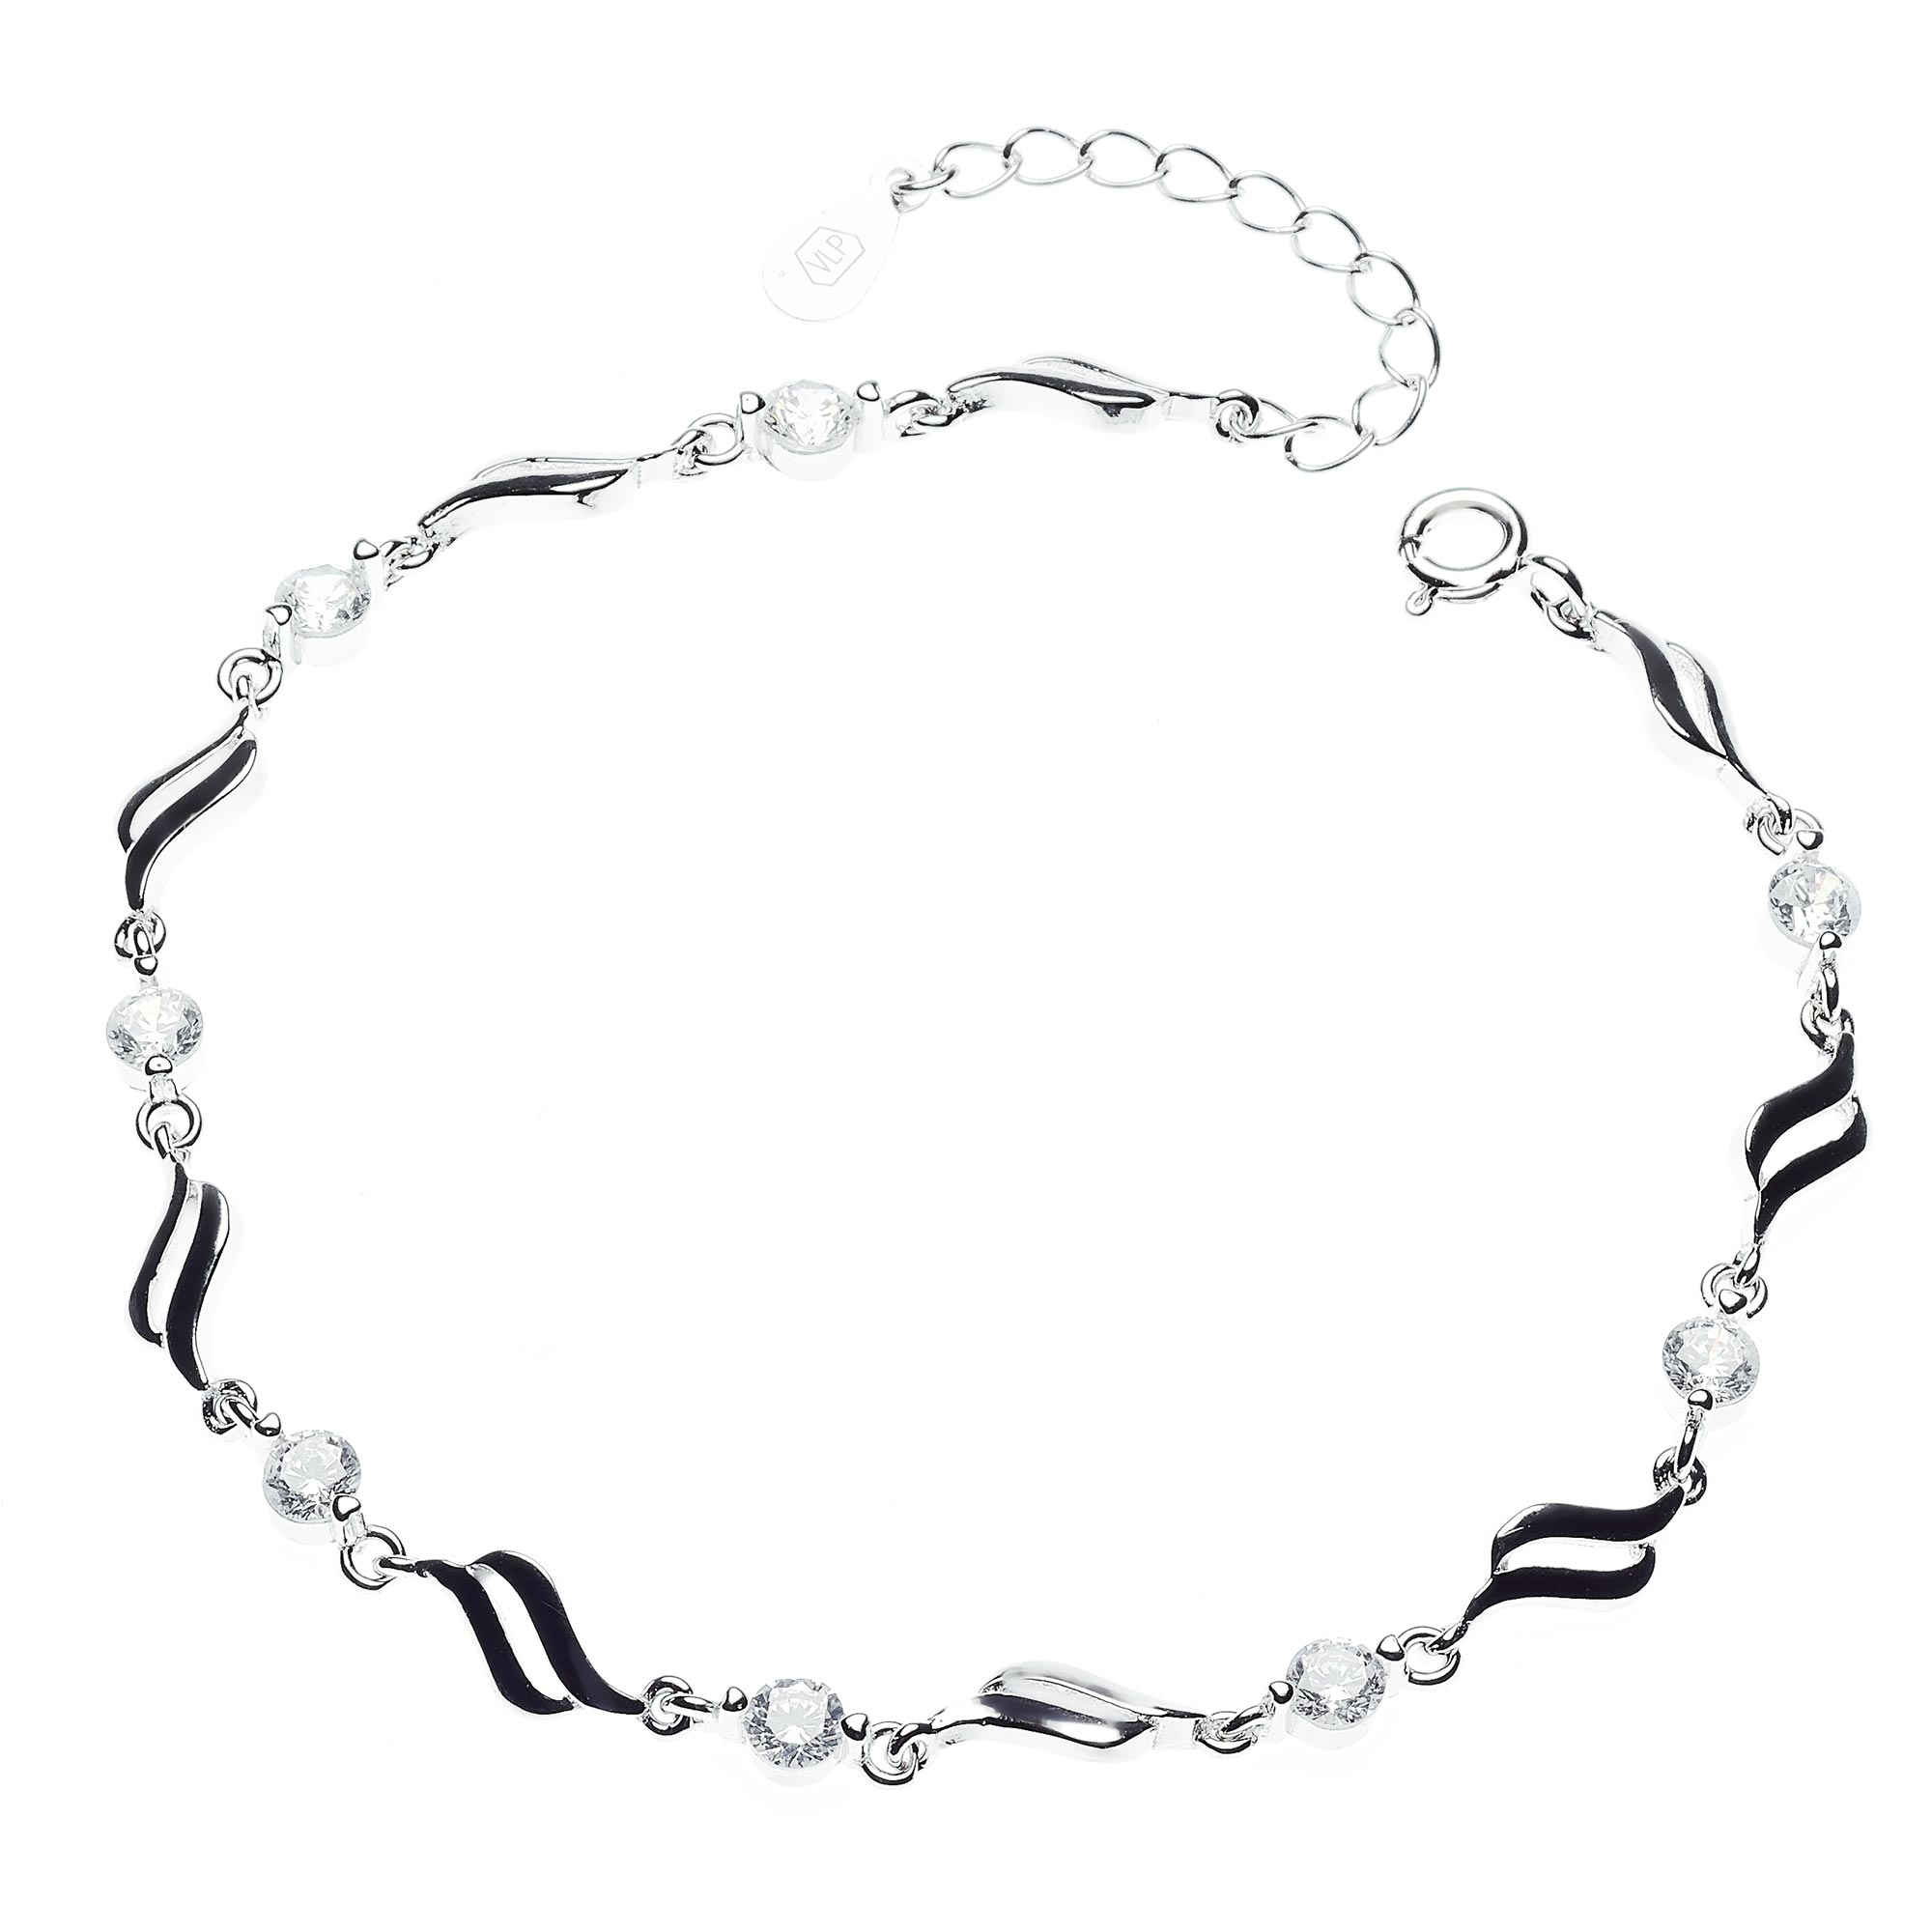 Dámský stříbrný náramek NB-1029